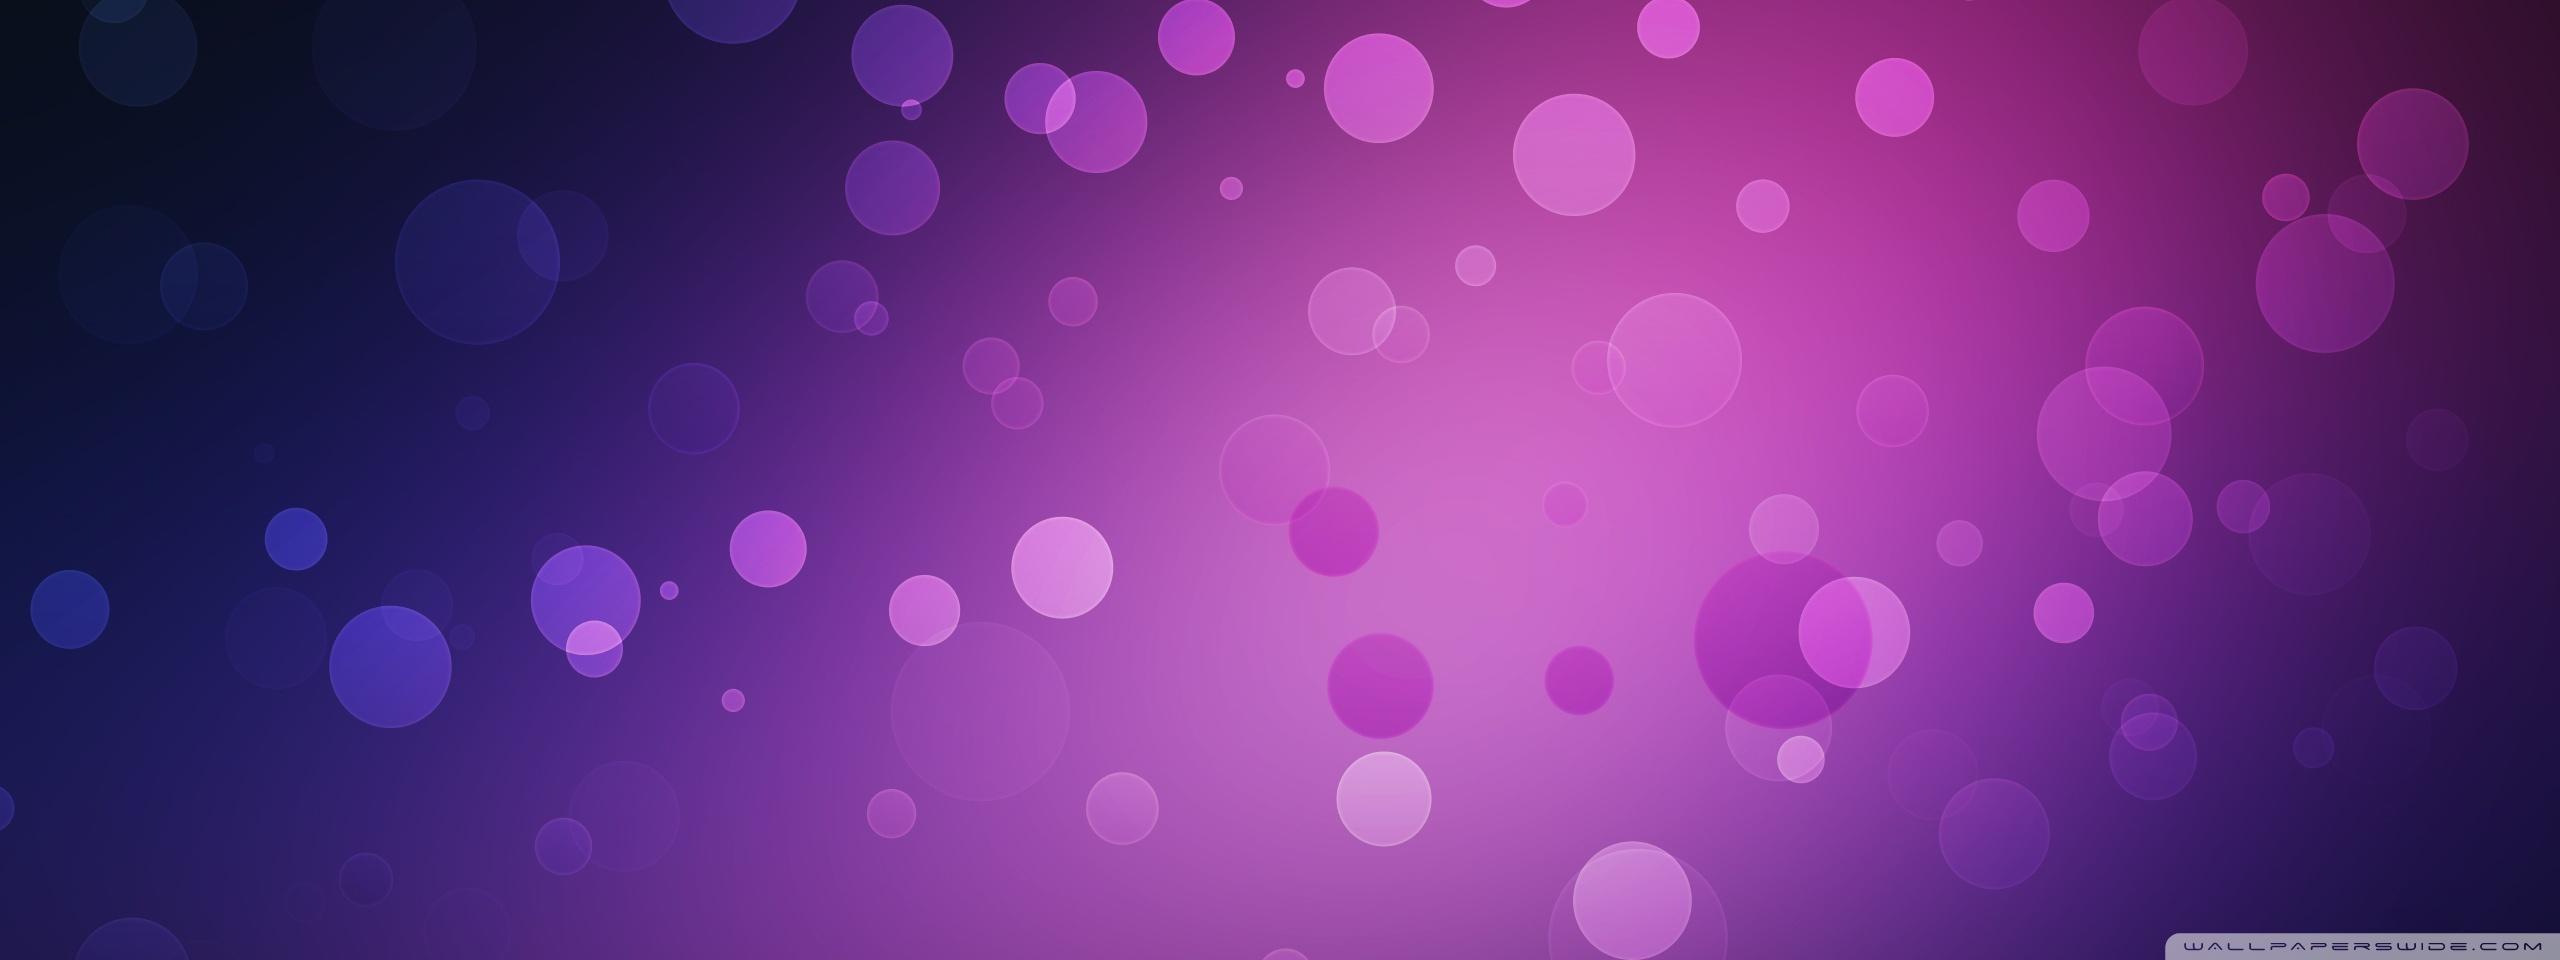 Purple Circles 4K HD Desktop Wallpaper for 4K Ultra HD TV 2560x960